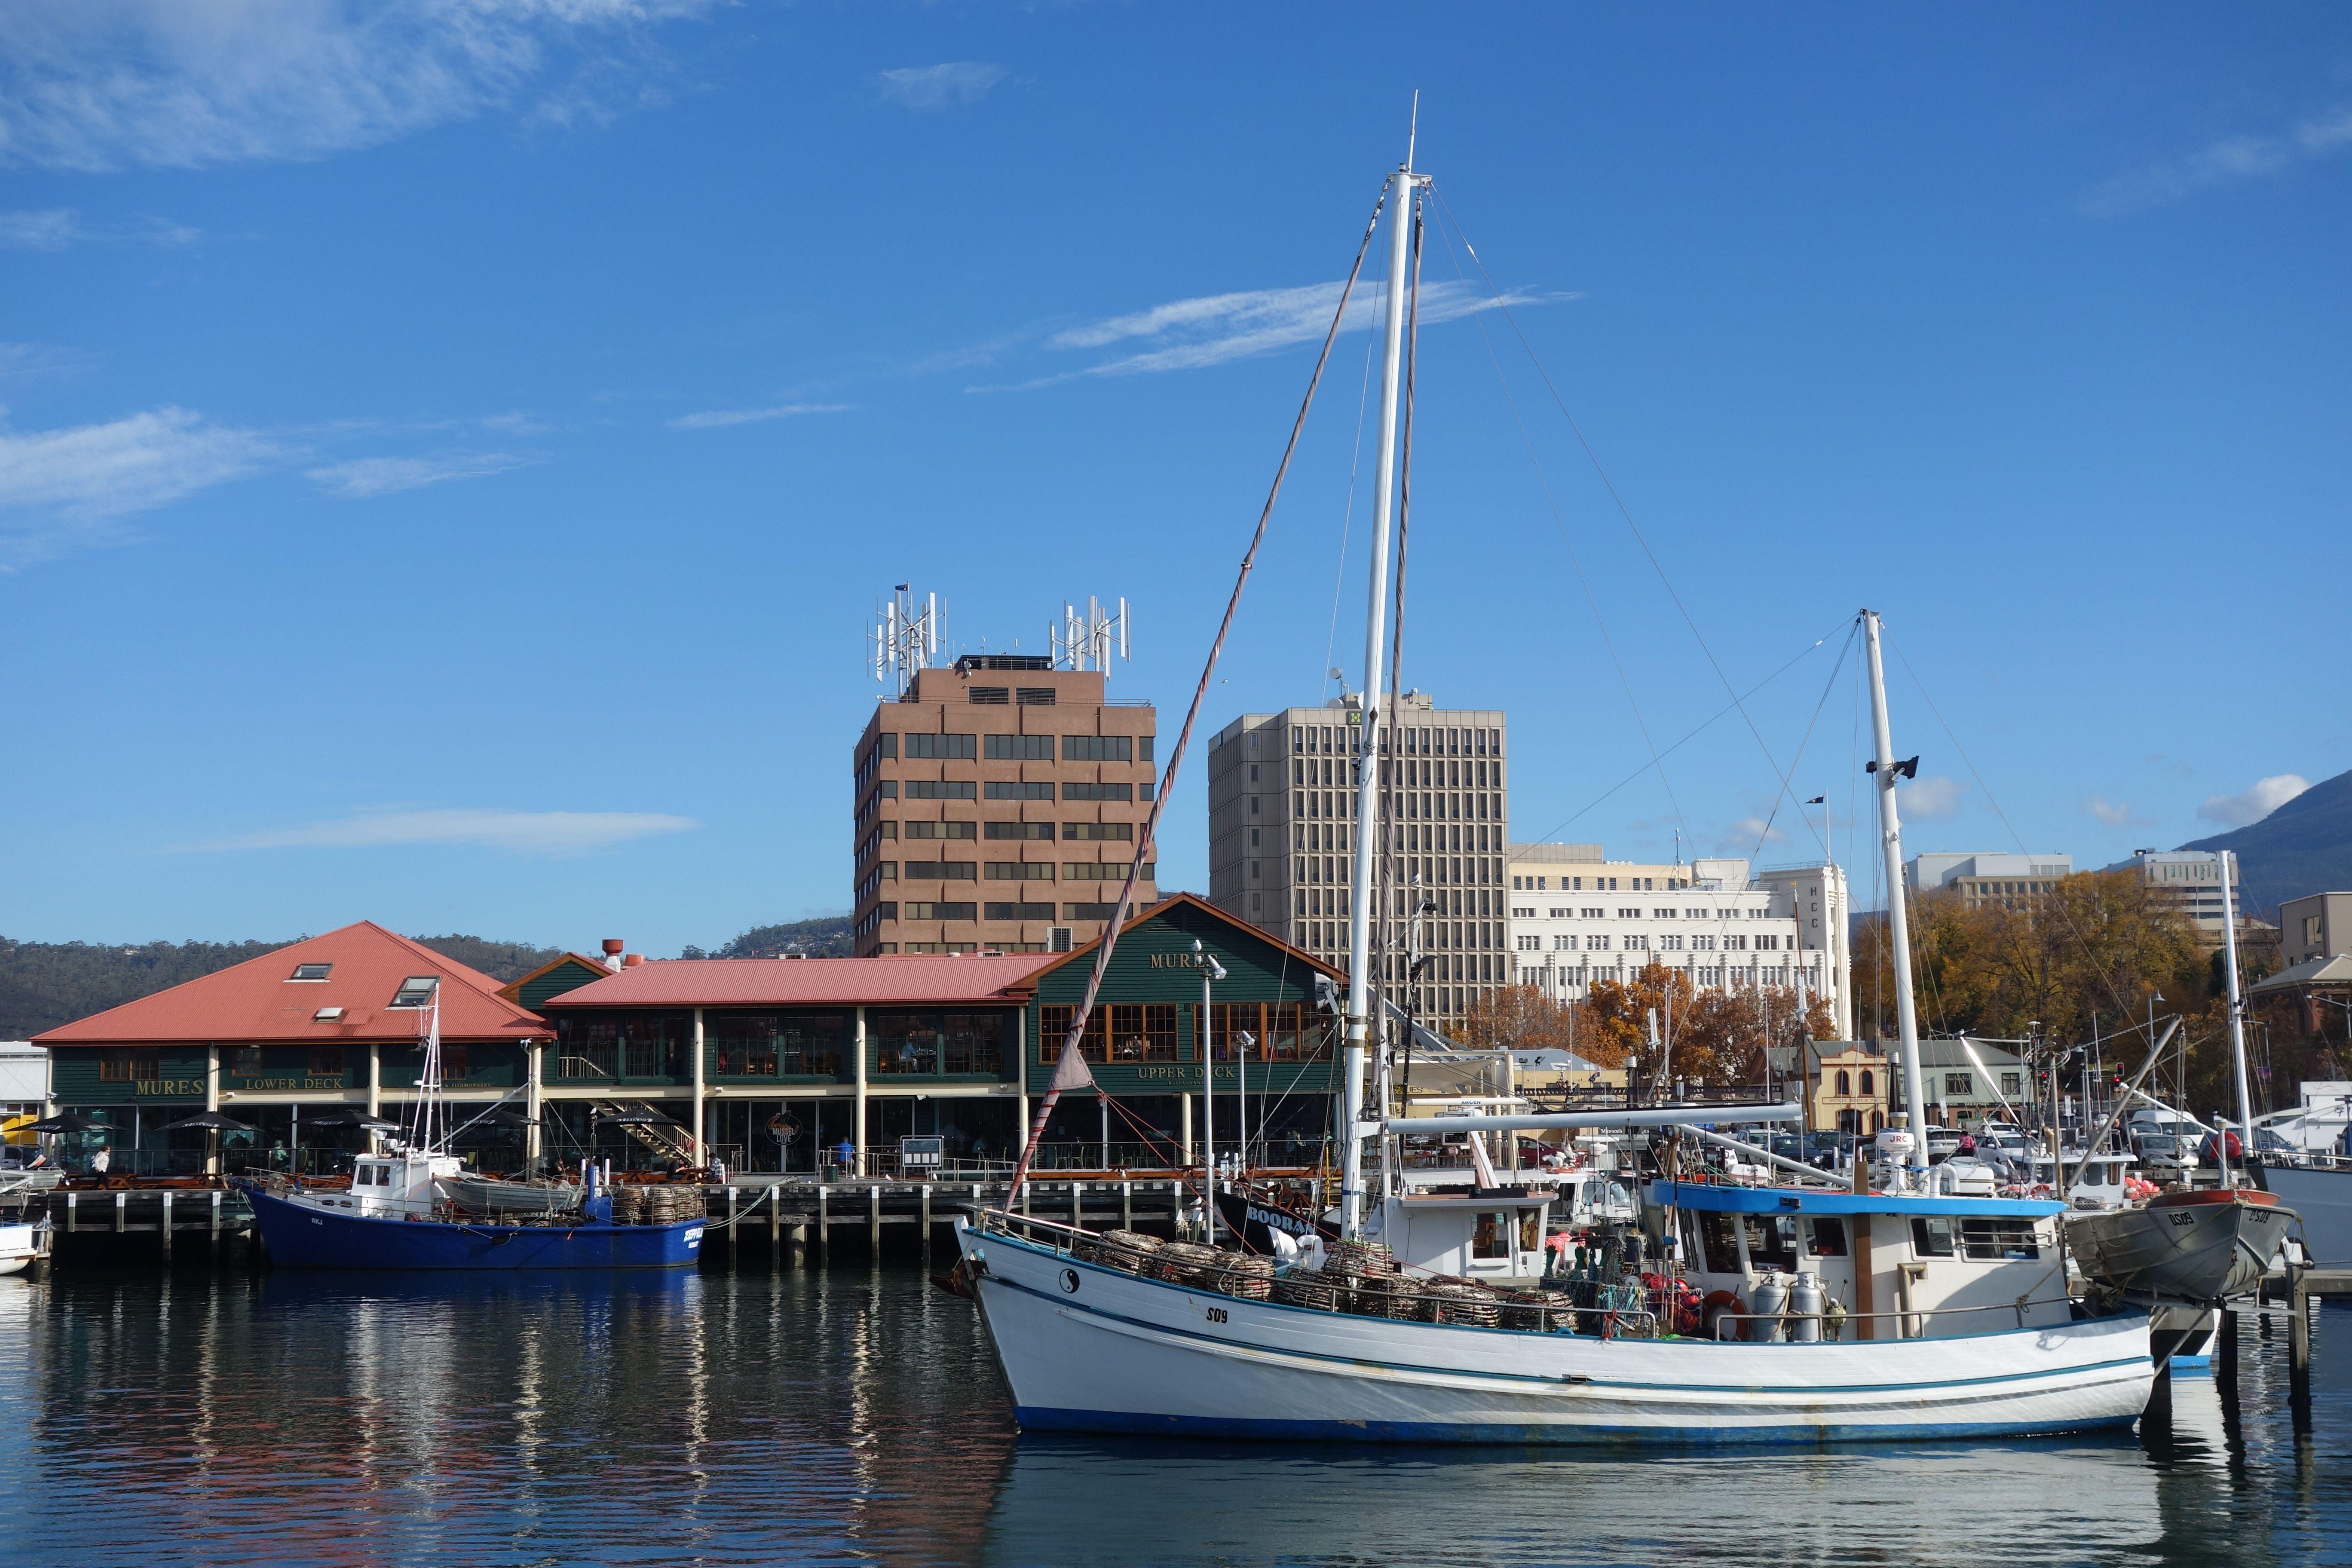 Australie- Tasmanie: Le Port d'Hobart.